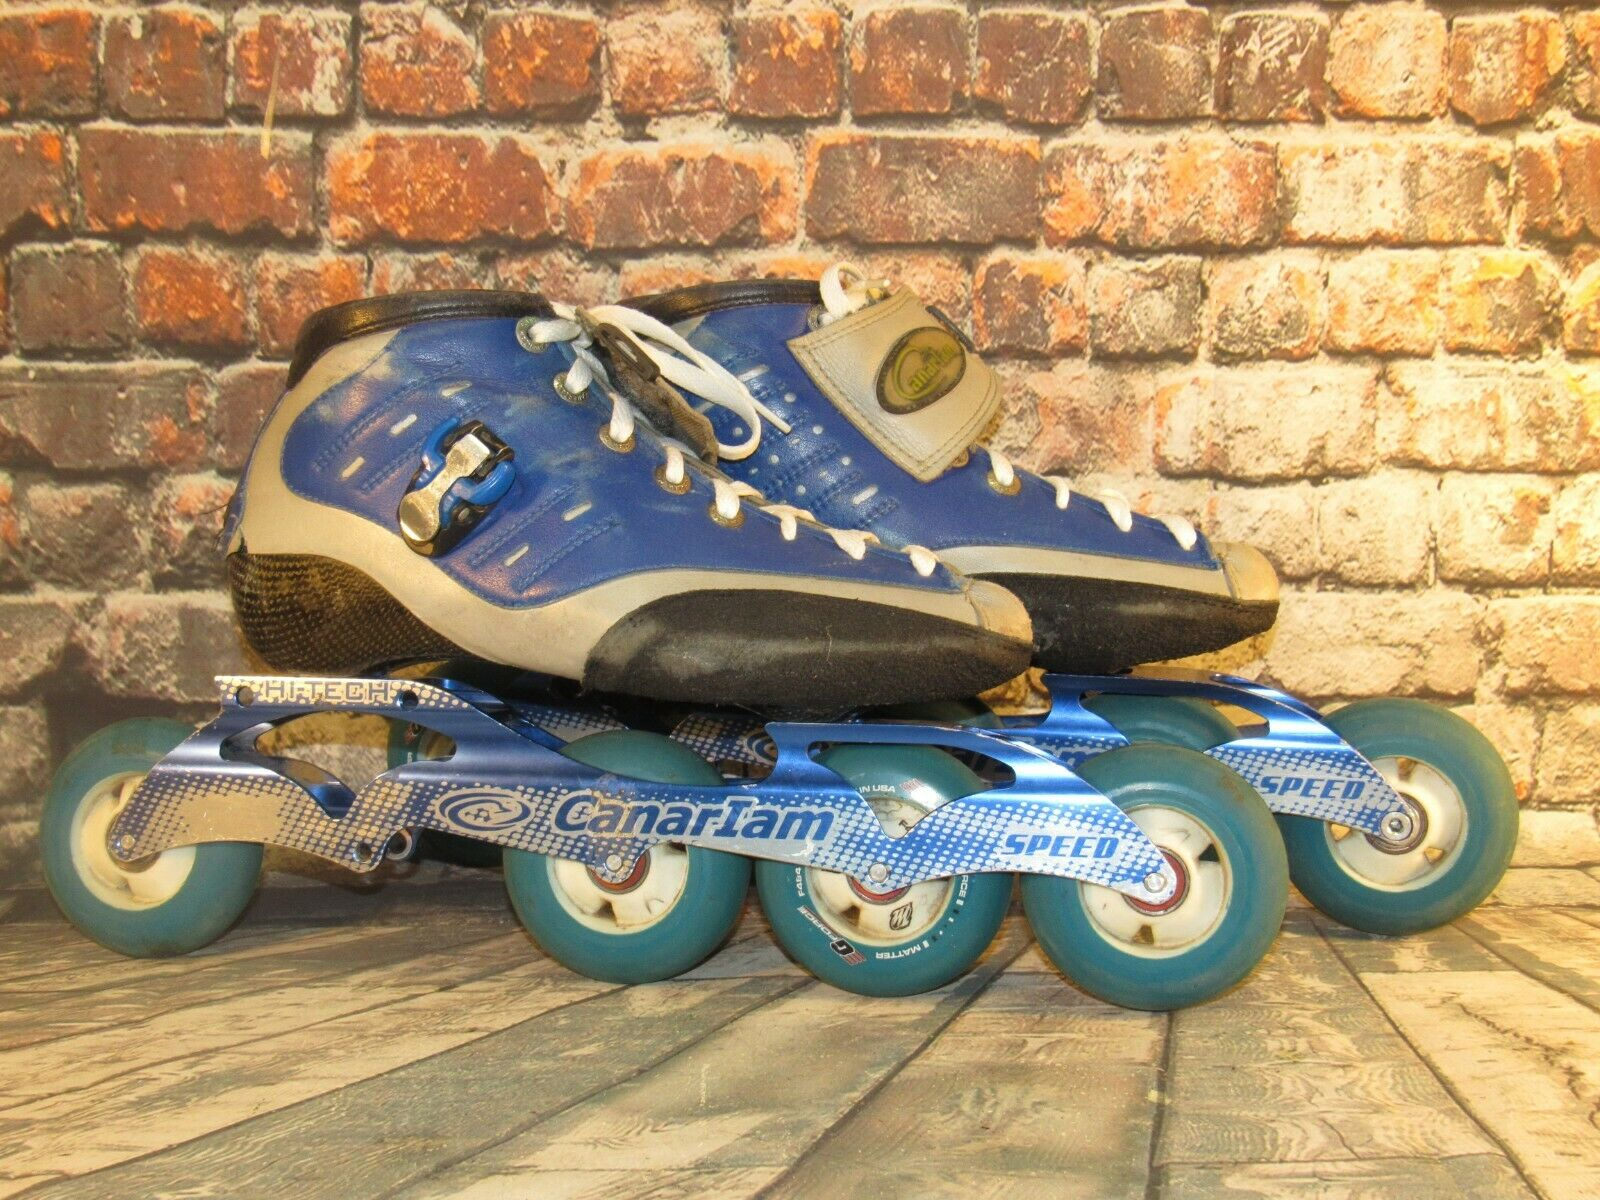 Canariam Raptor Inline Speed S   EU Size  39  cheap wholesale